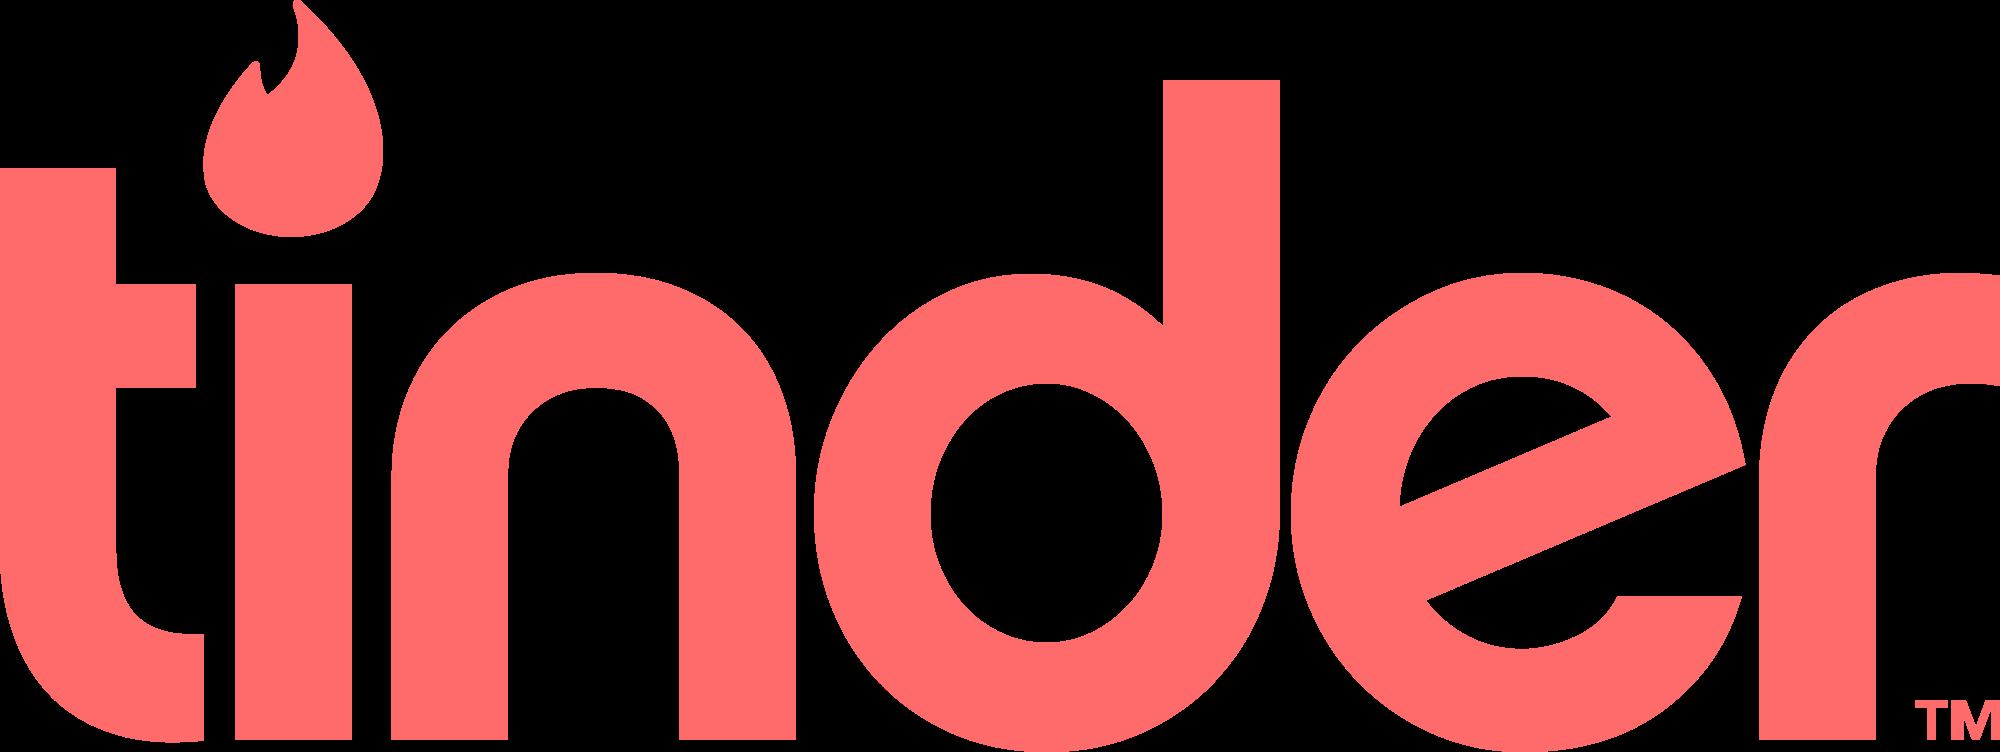 Tinder Logo PNG